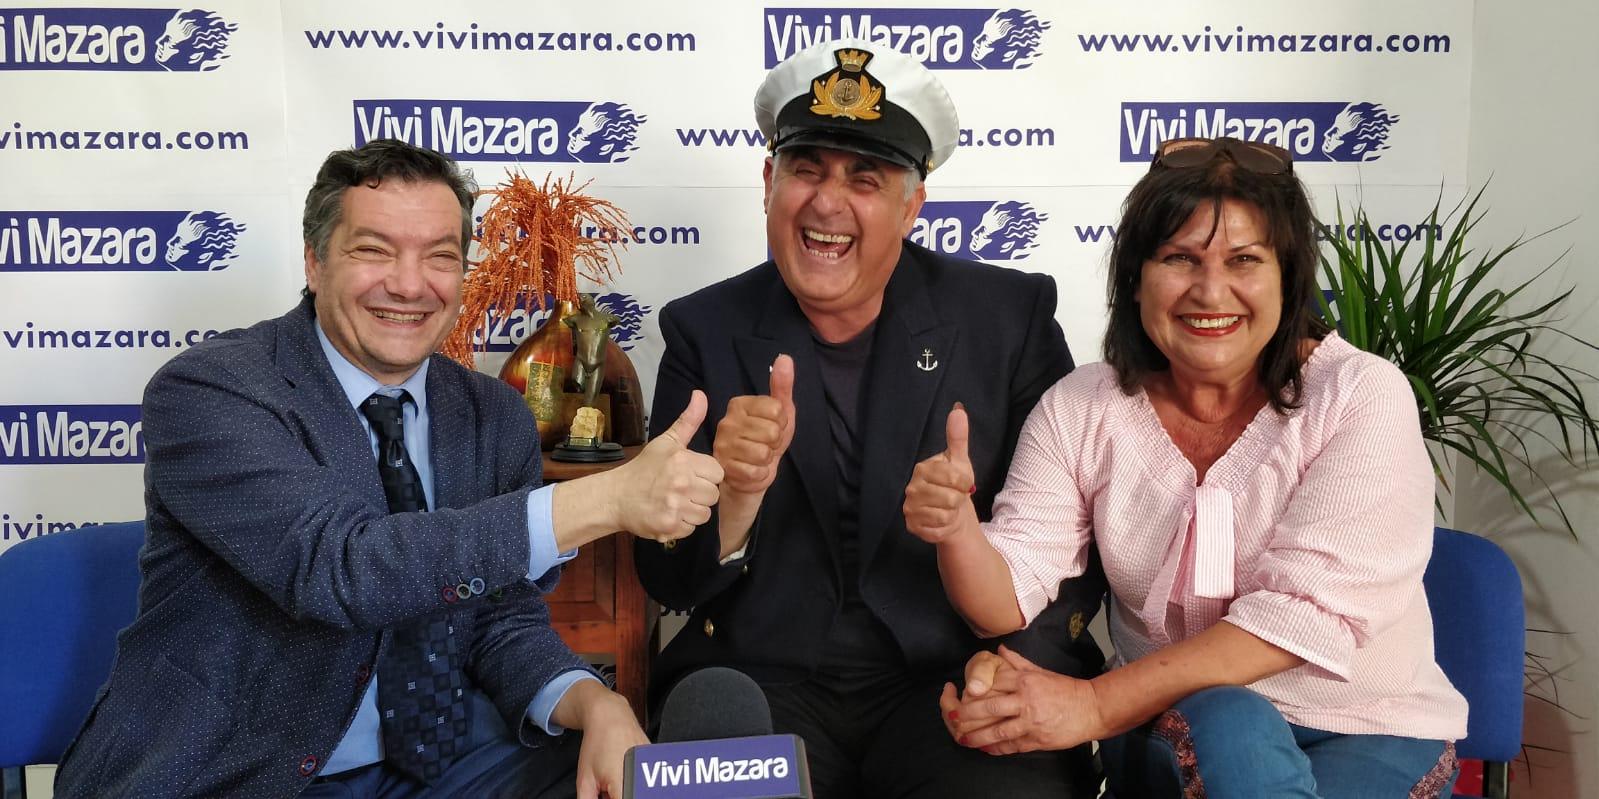 Video intervista con Filippo Quatra e Francesca Incandela